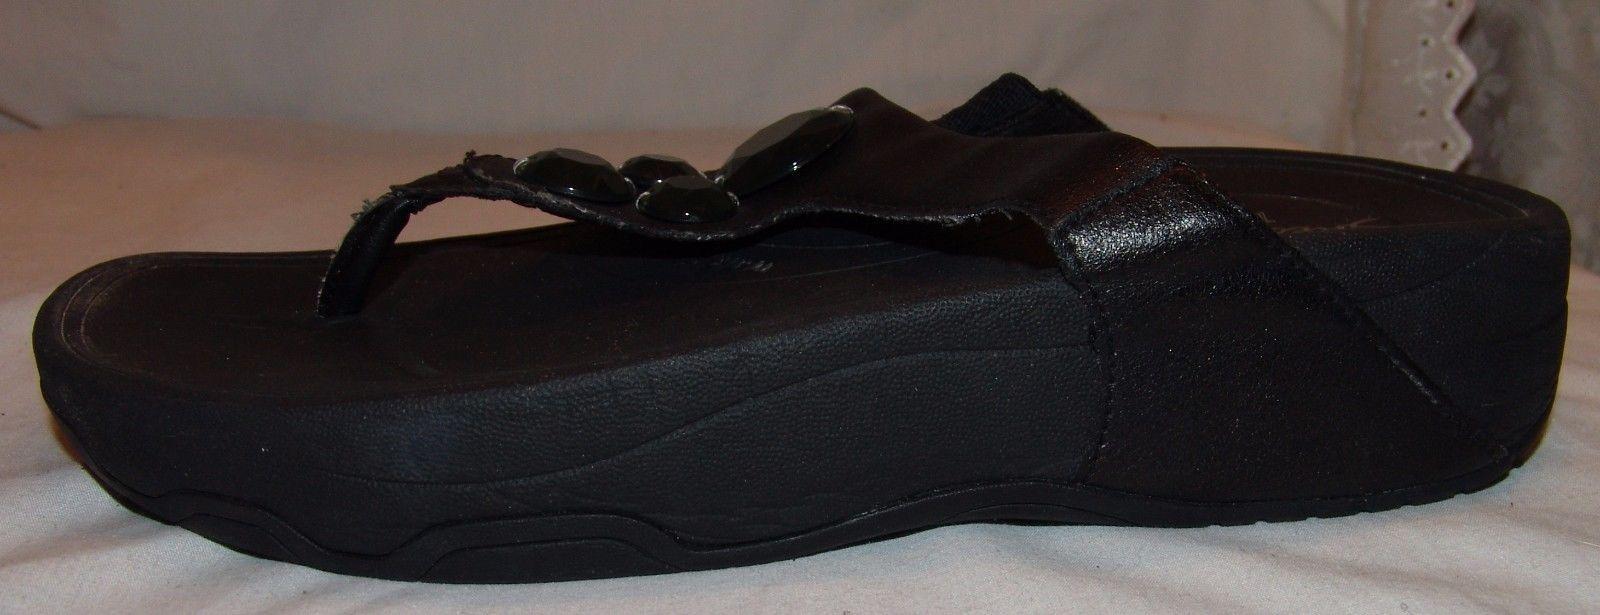 Skechers Tone Ups Flip Flops 8 8.5 Black w/ Green Gemstones Sandals Shoes